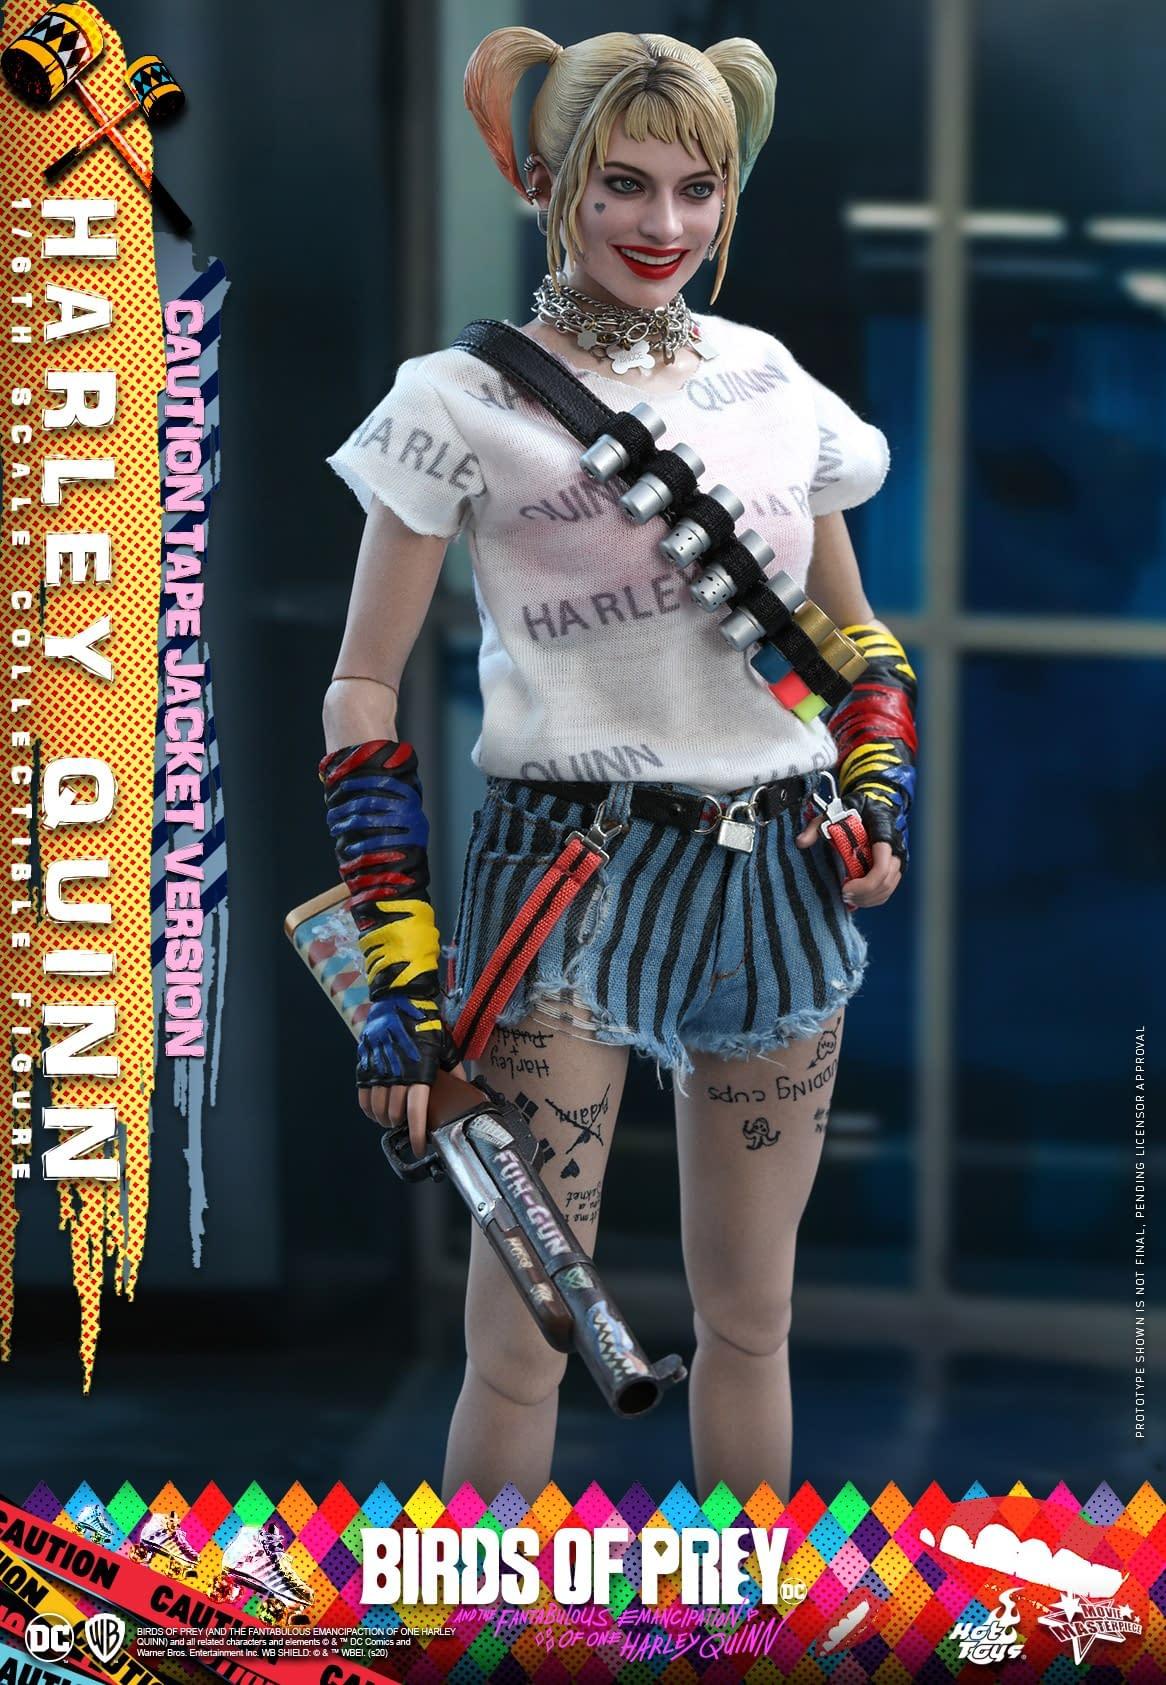 Harley Quinn Gets A New